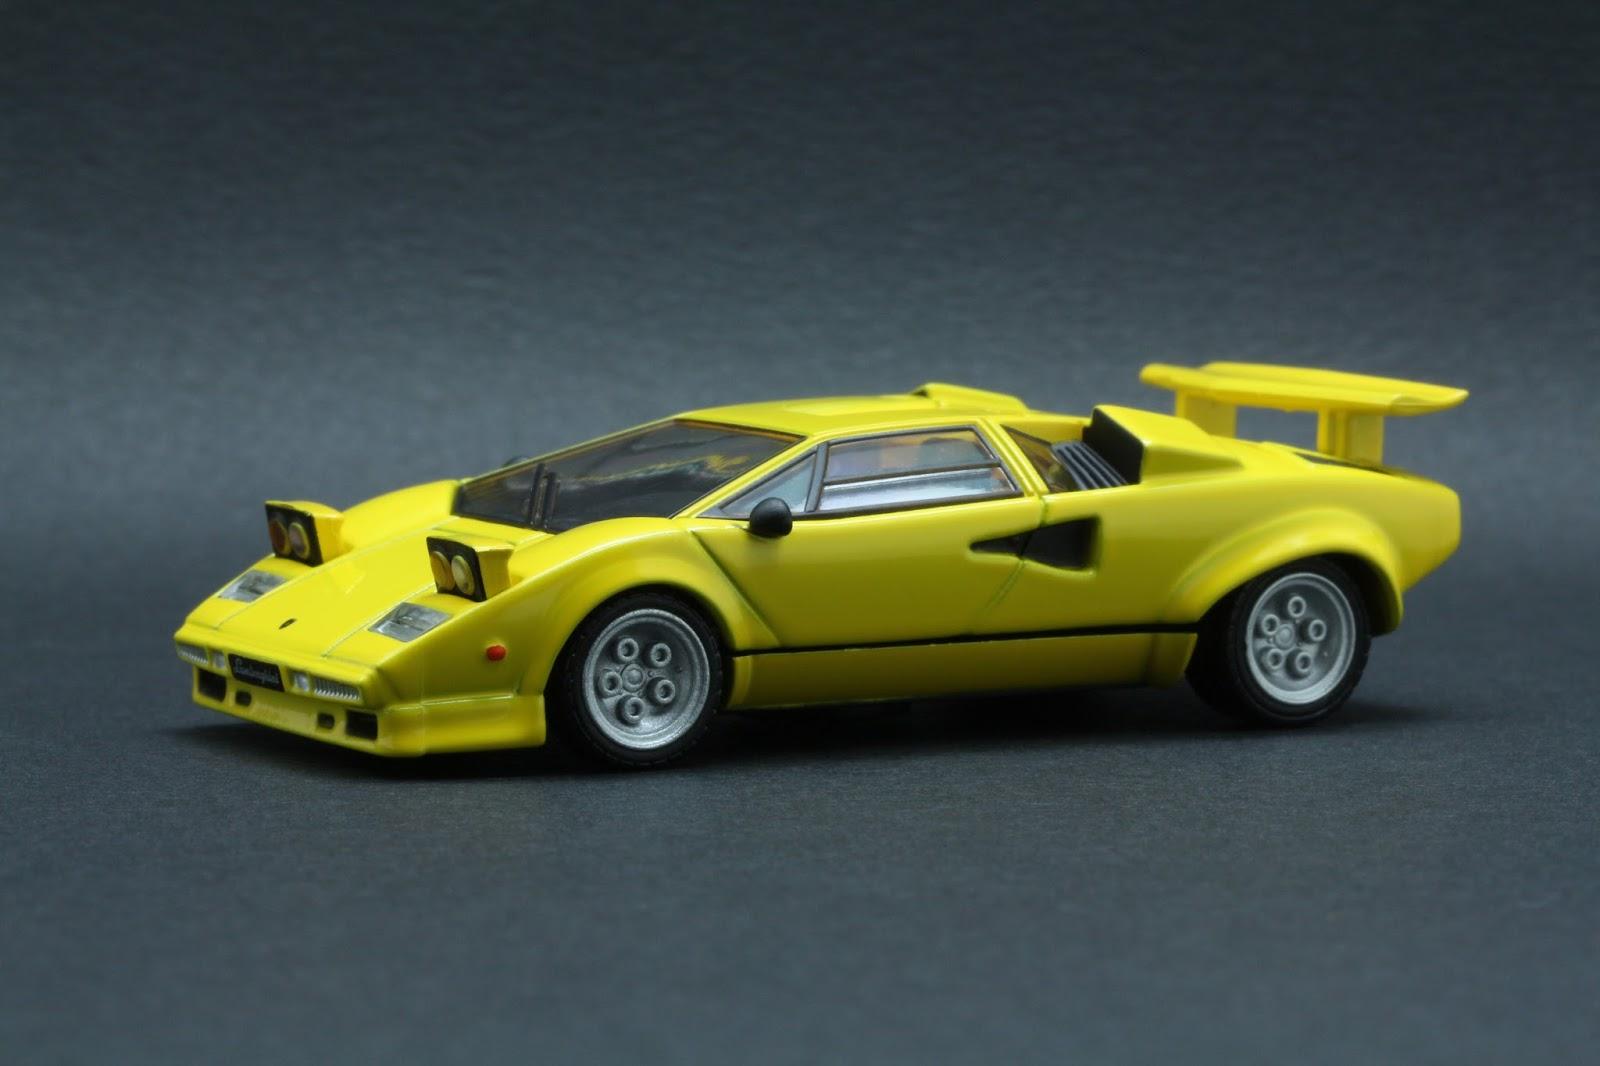 Diecast Hobbist Lamborghini Countach Lp500s